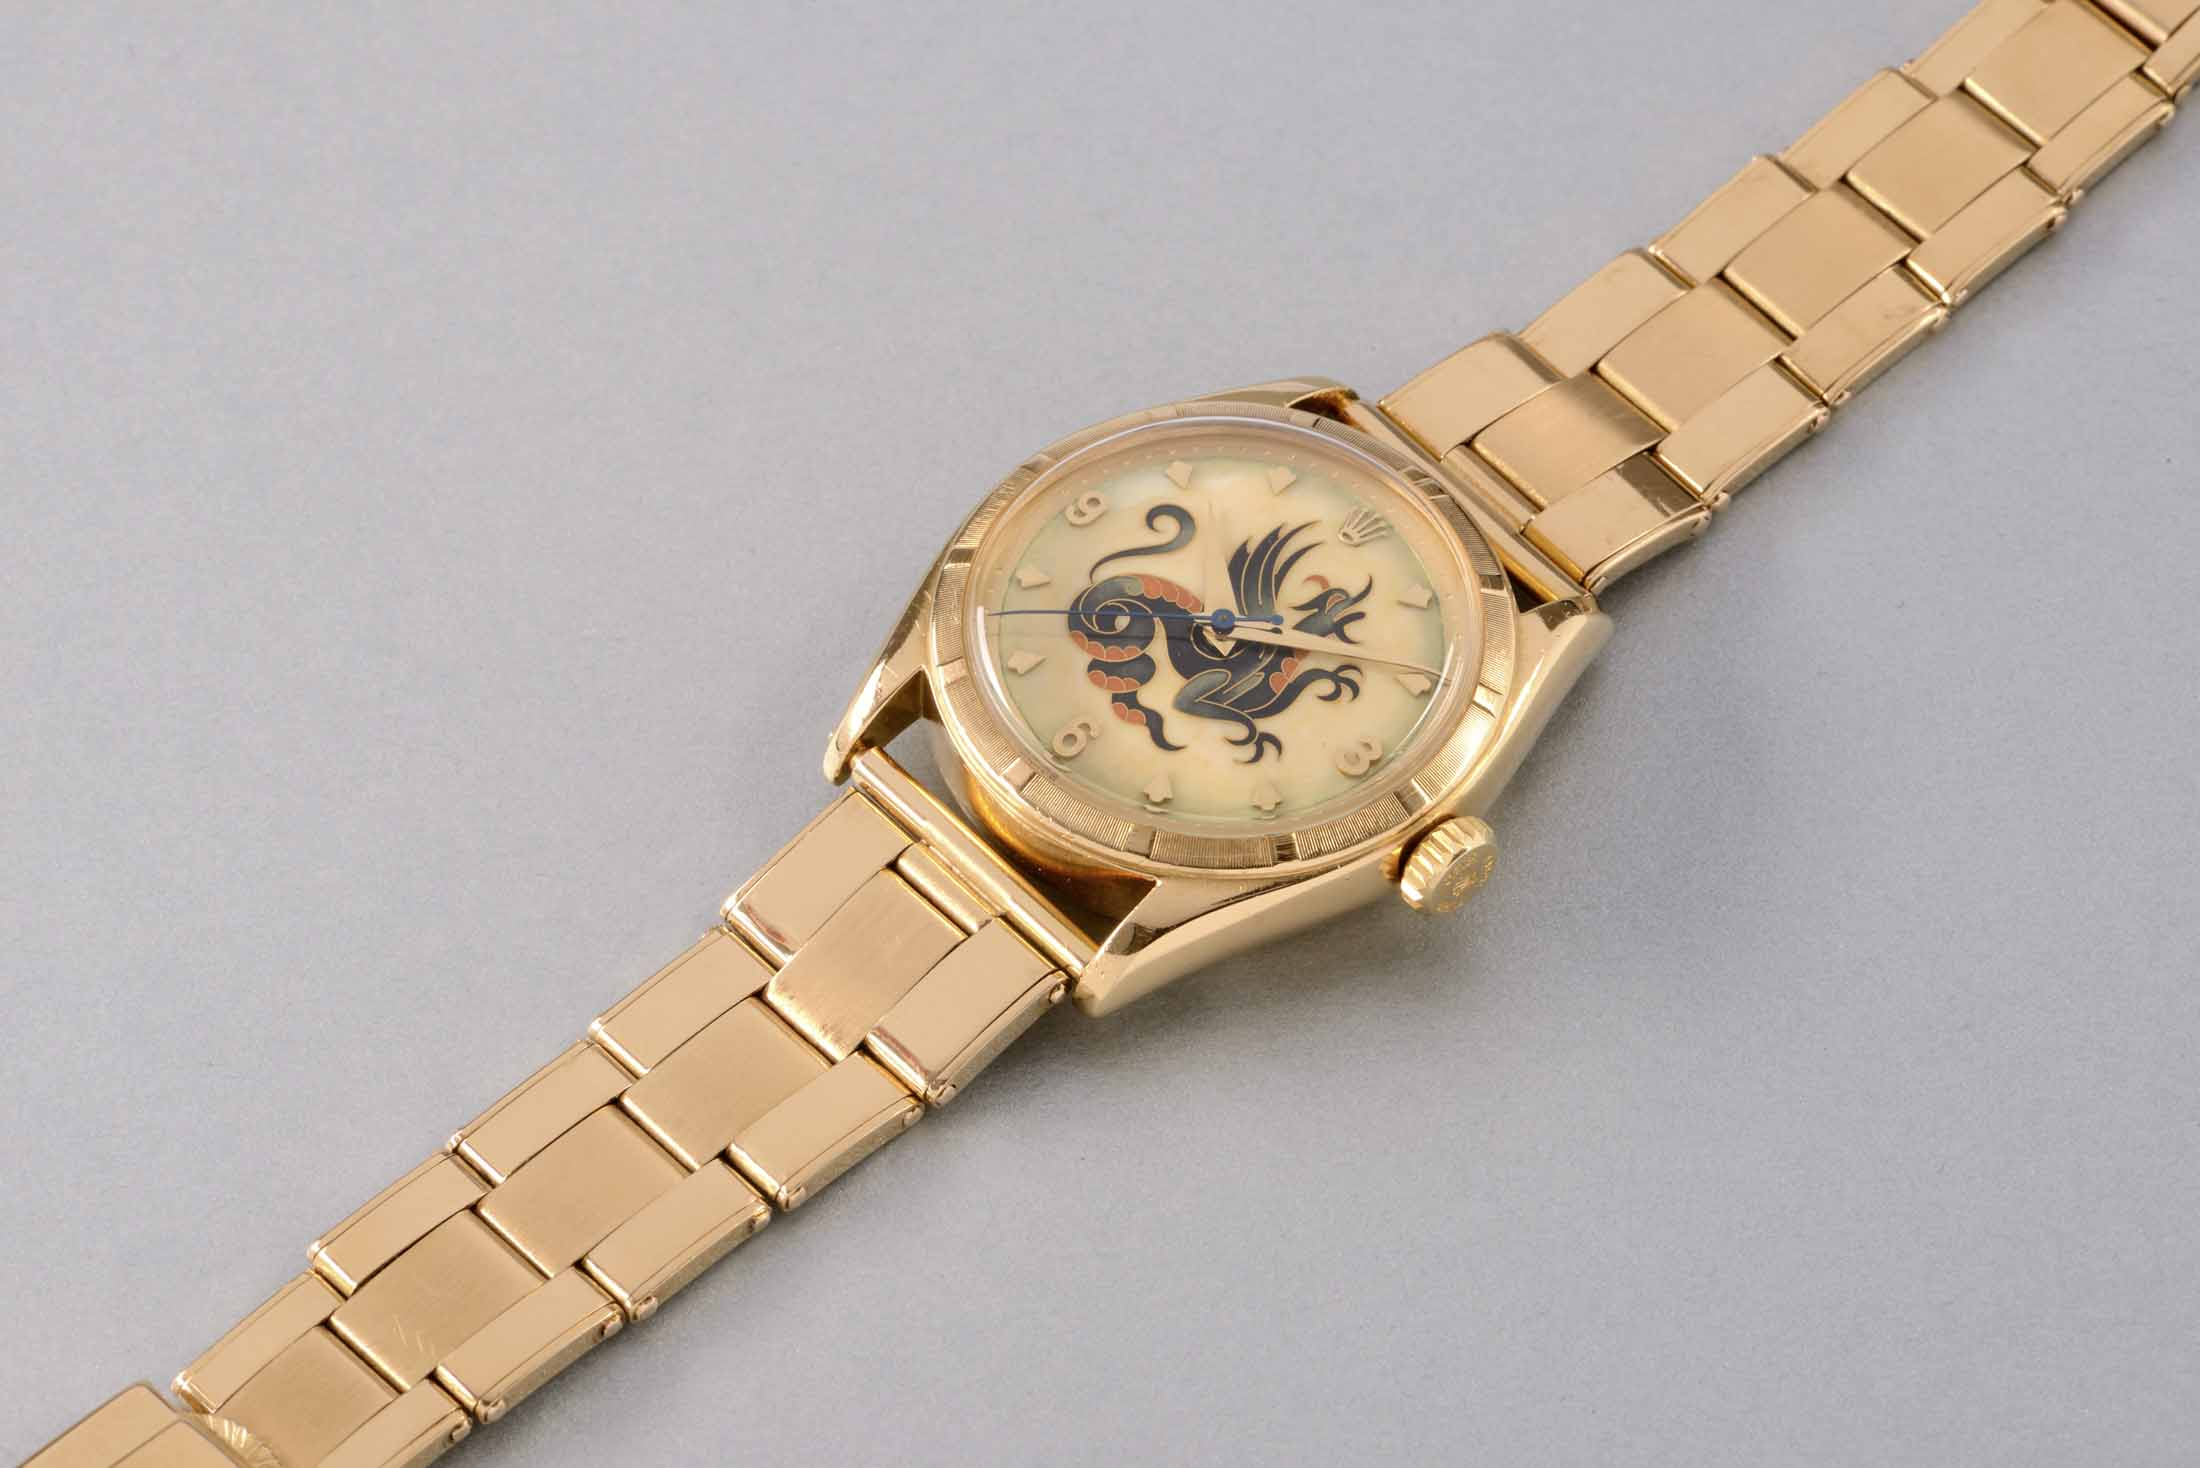 Rolex Yellow Gold Wristwatch With Dragon Cloisonné EnamelDial